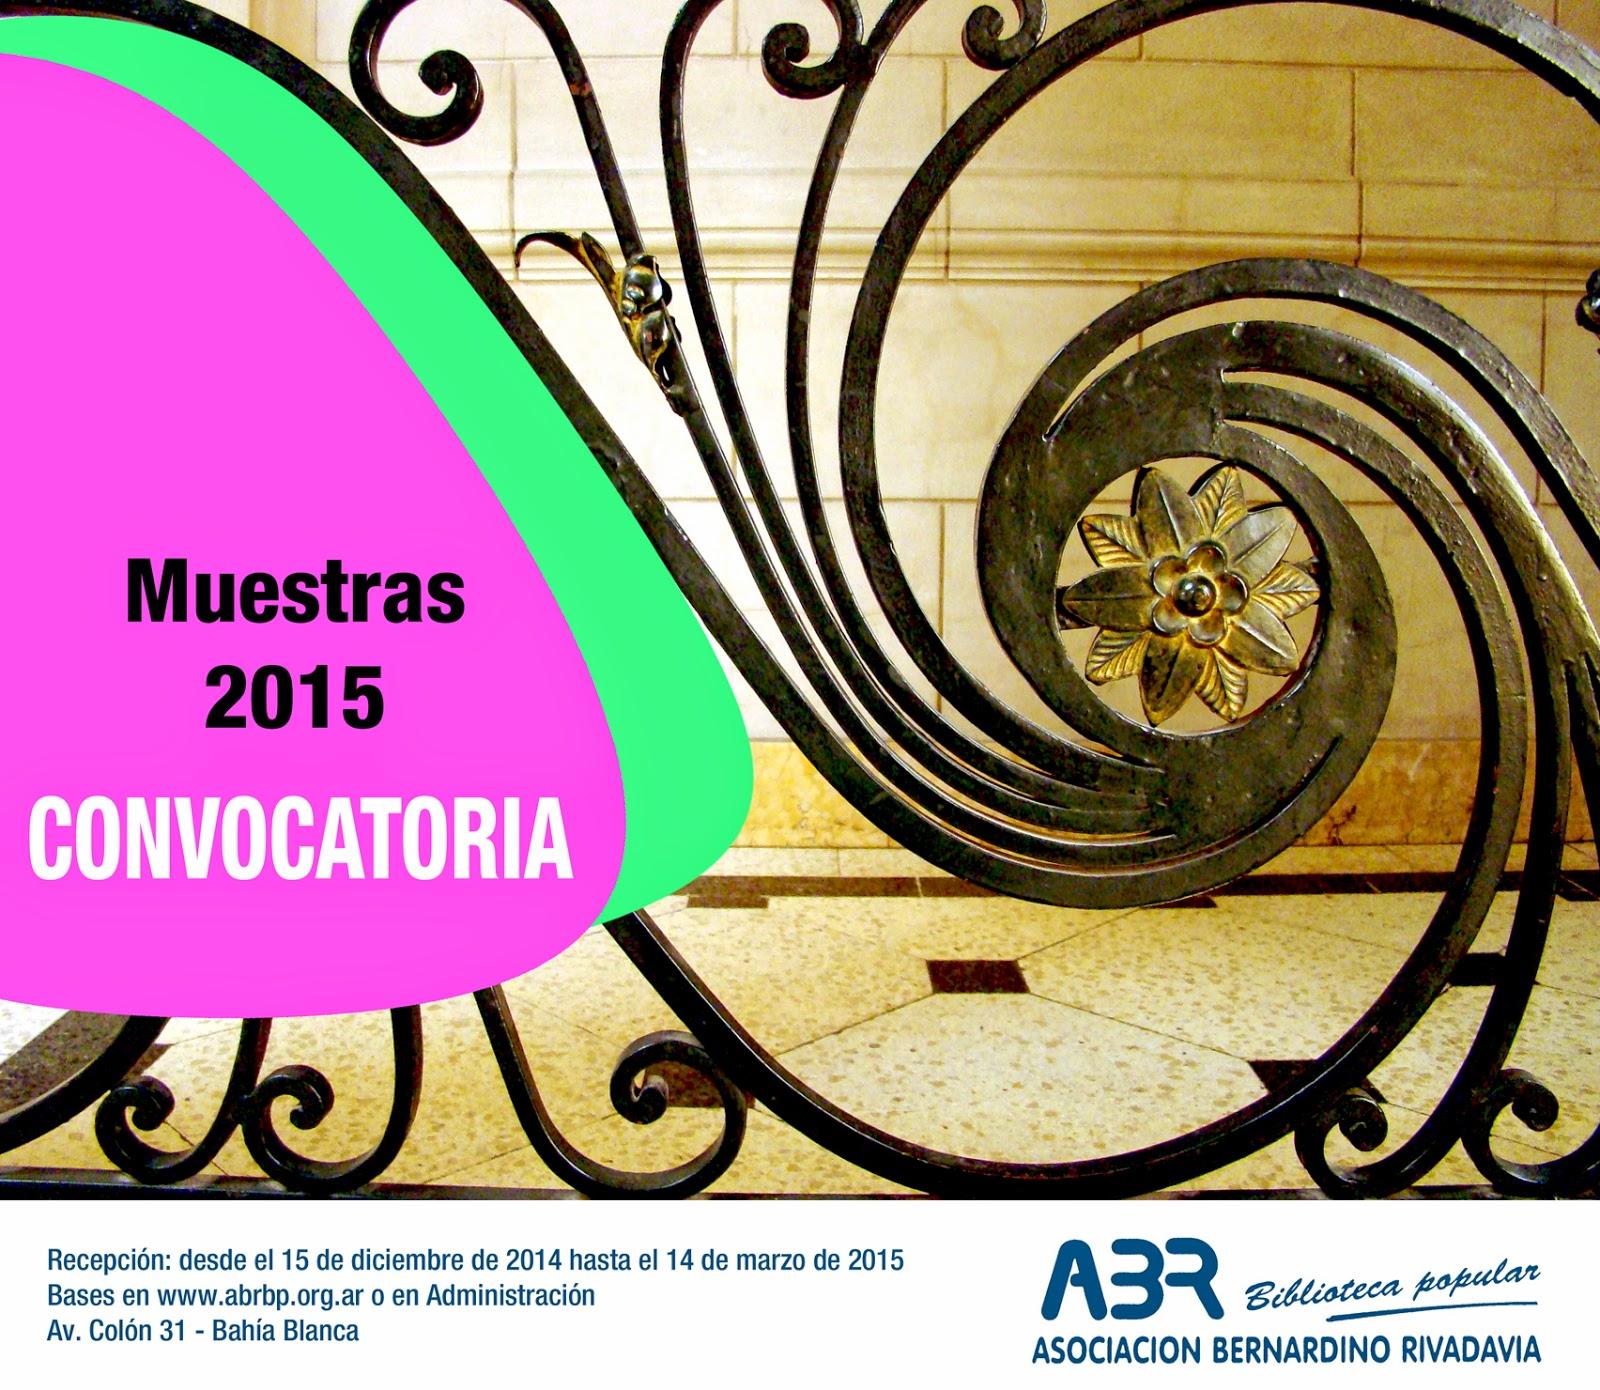 Convocatoria a Muestras ABR 2015